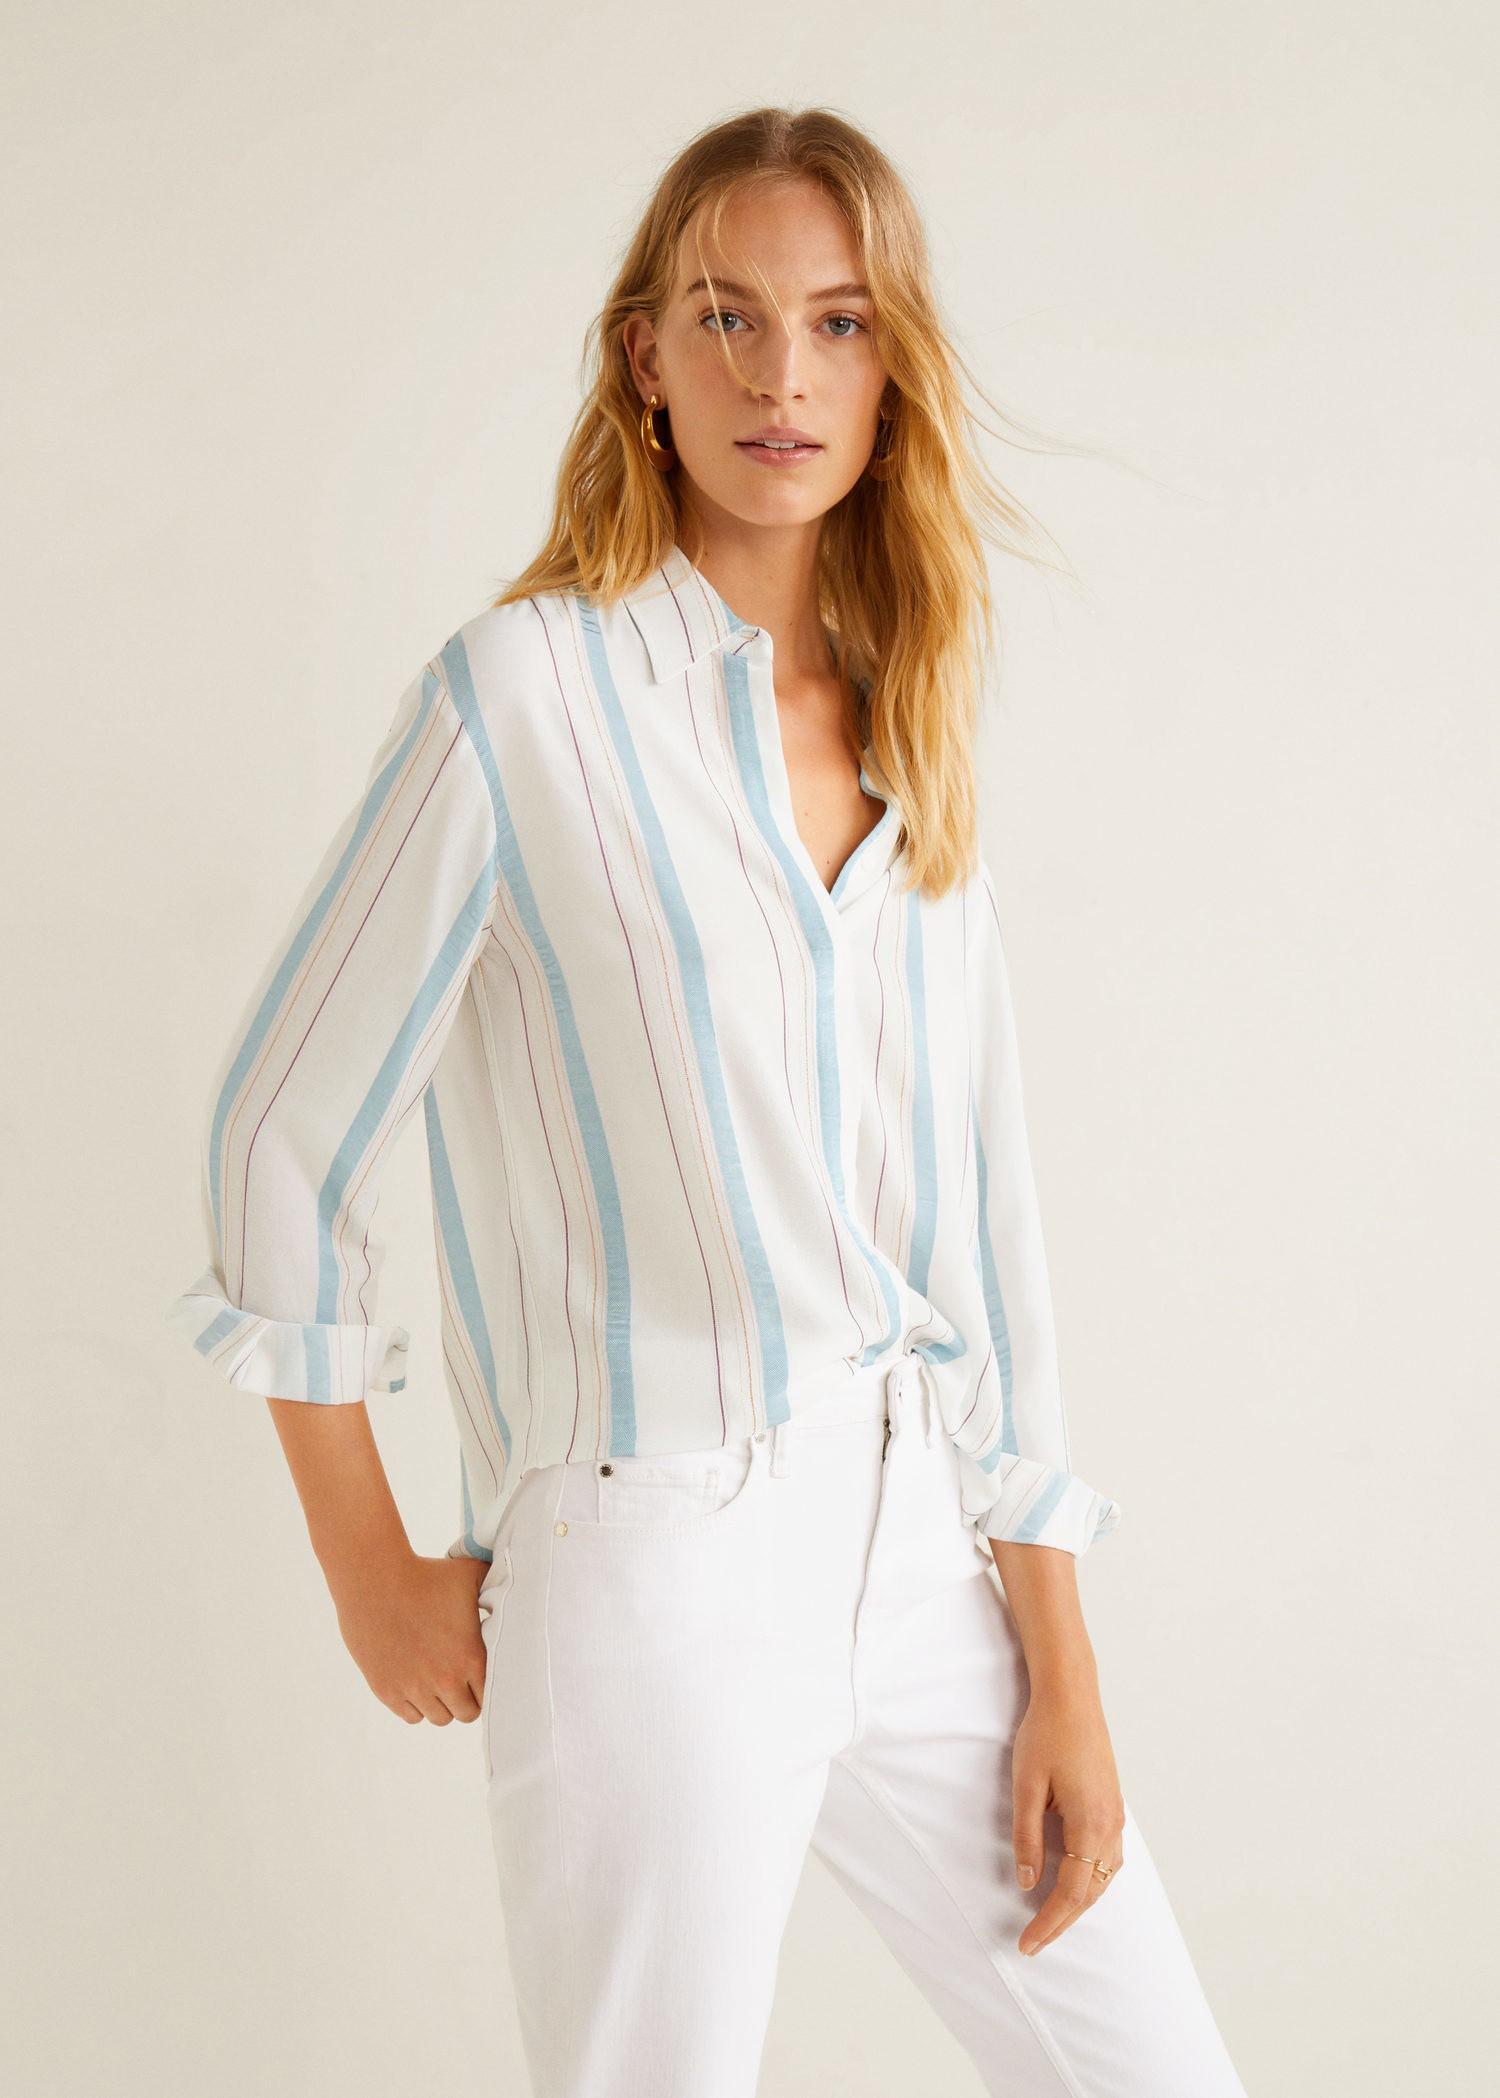 a1588ad512 Metallic striped shirt by Mango